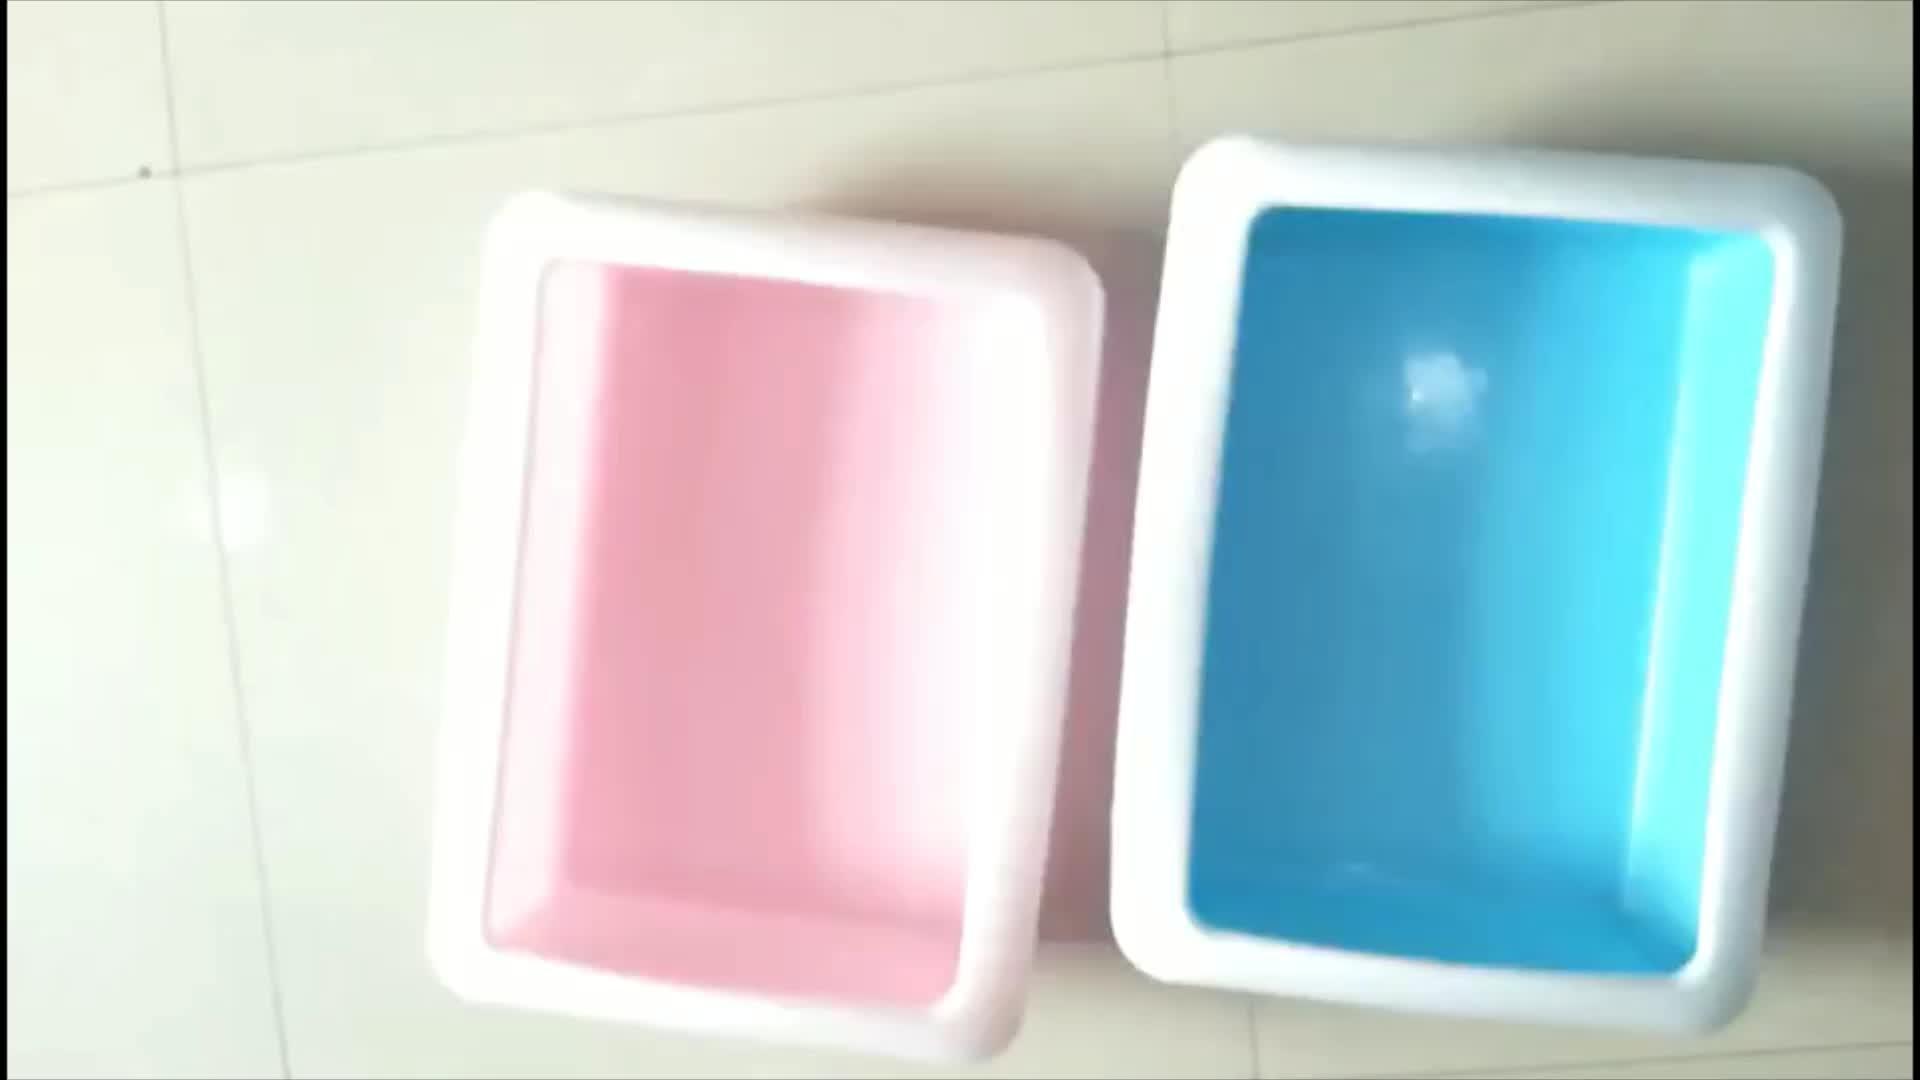 PP Material impermeable gato baño impermeable titular de papel higiénico con cubierta